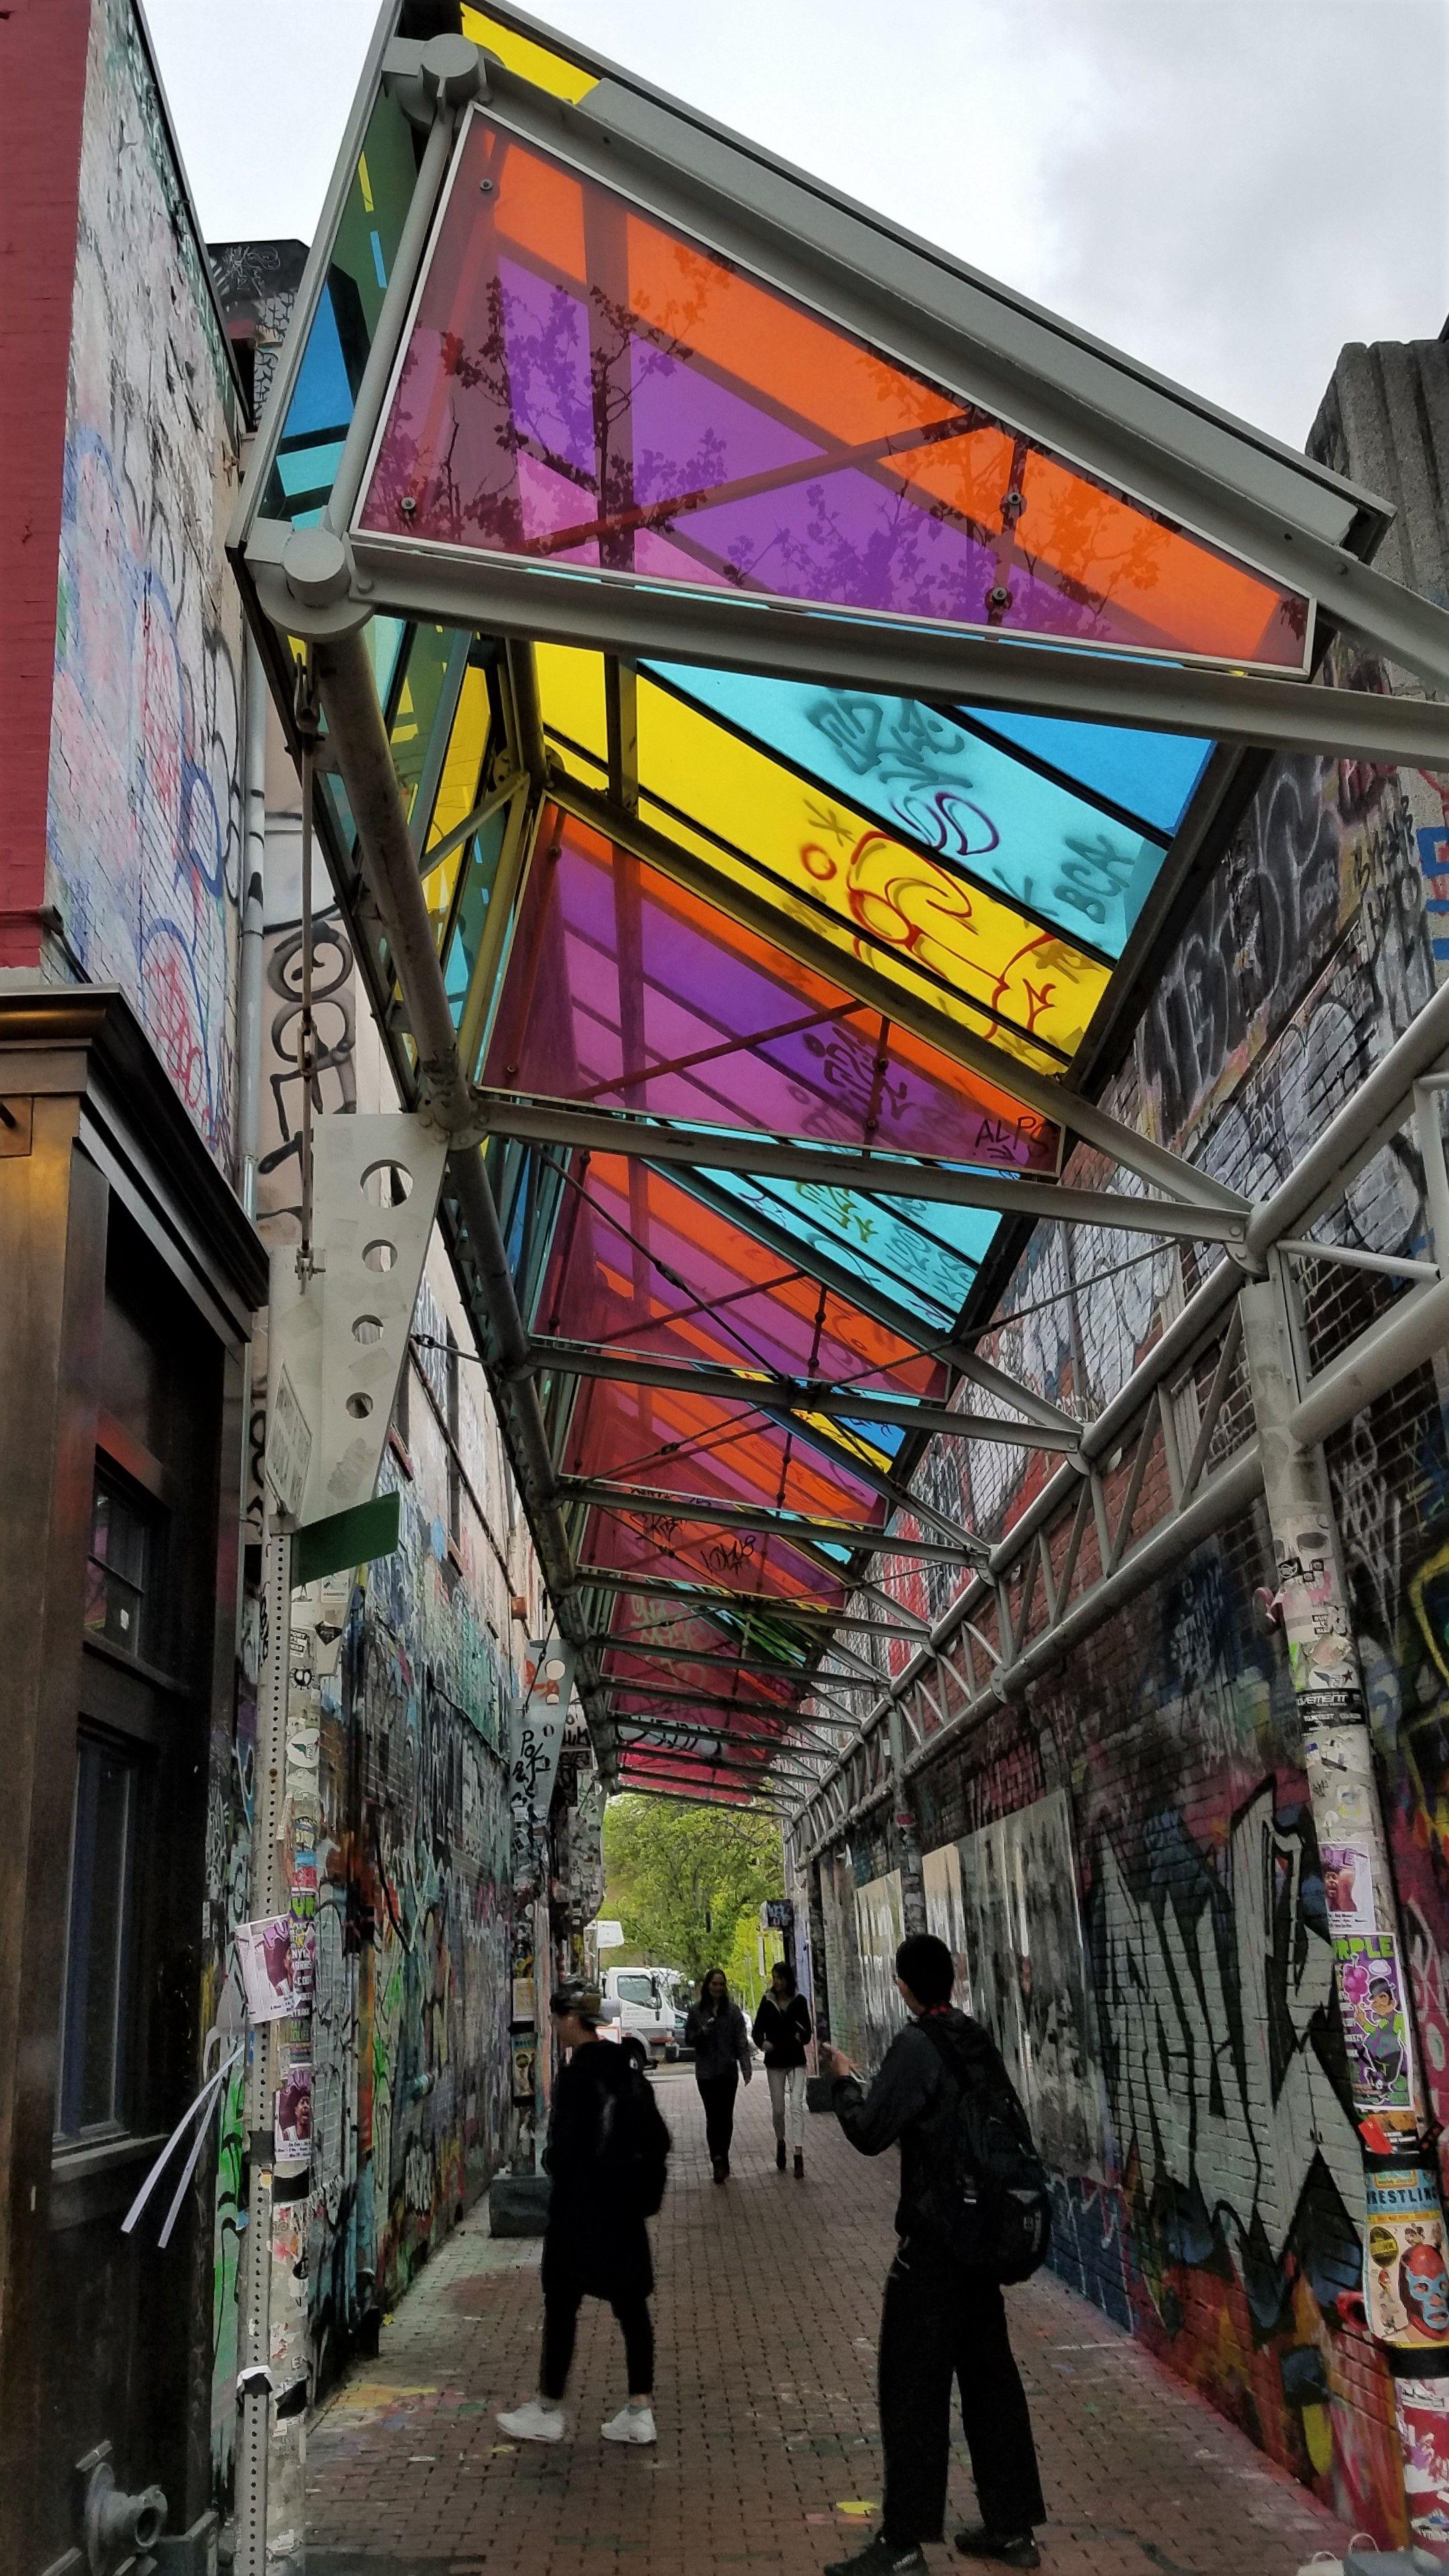 Graffiti wall cambridge - Cambridge Massachusetts Street Art Graffiti This Is The Art Alley In Central